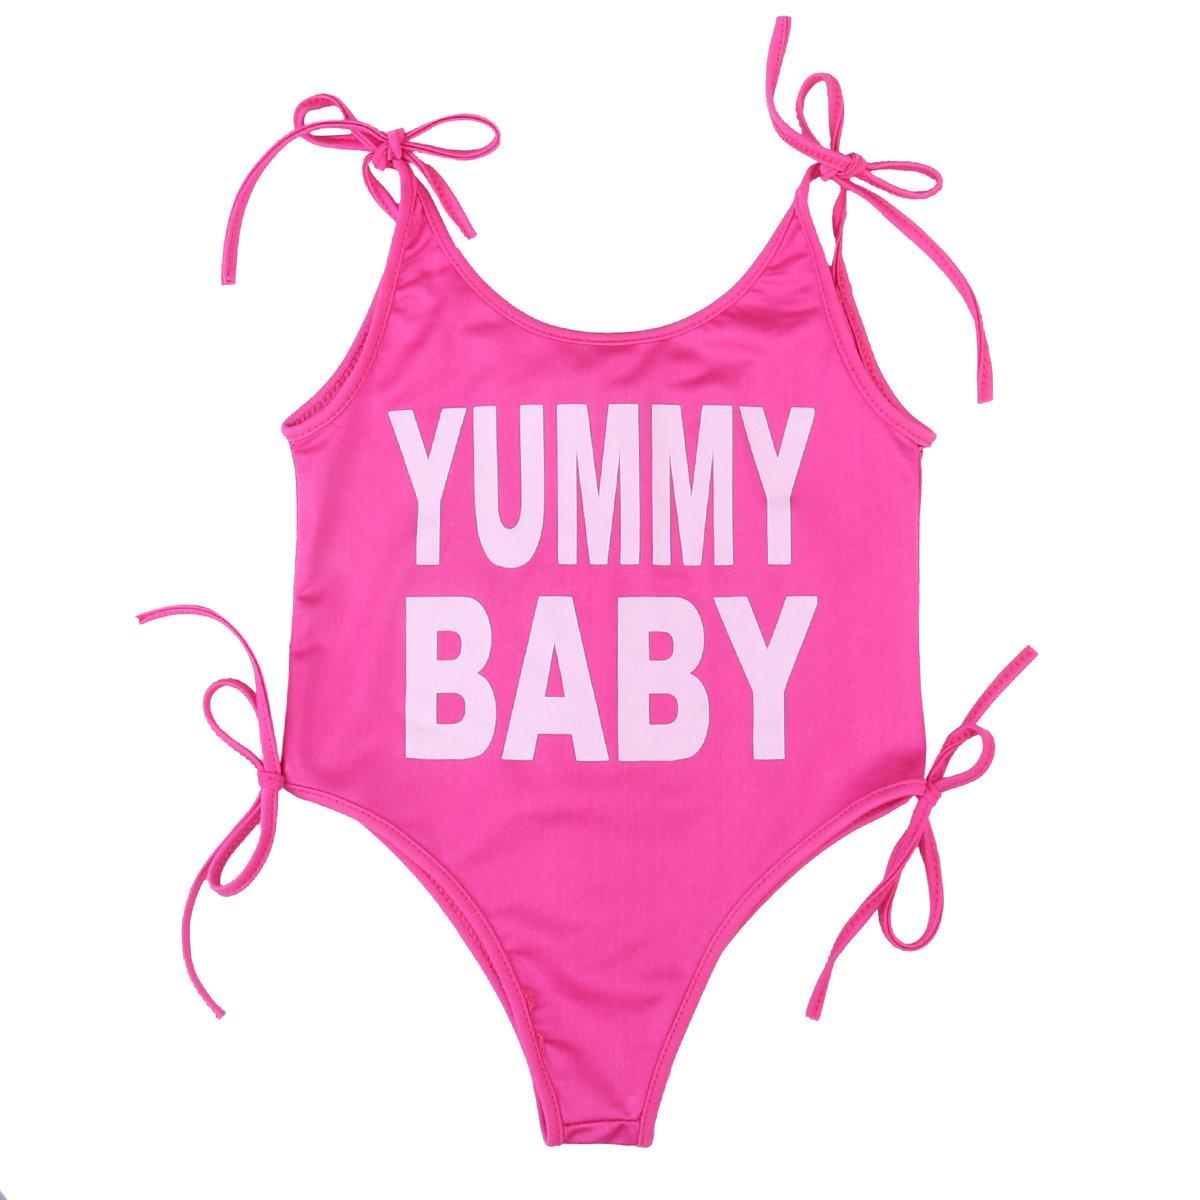 Lily.Pie Mom Baby Girls Matching Swimwear Outfits Women Bikini Beachwear Kids Bathing Suits